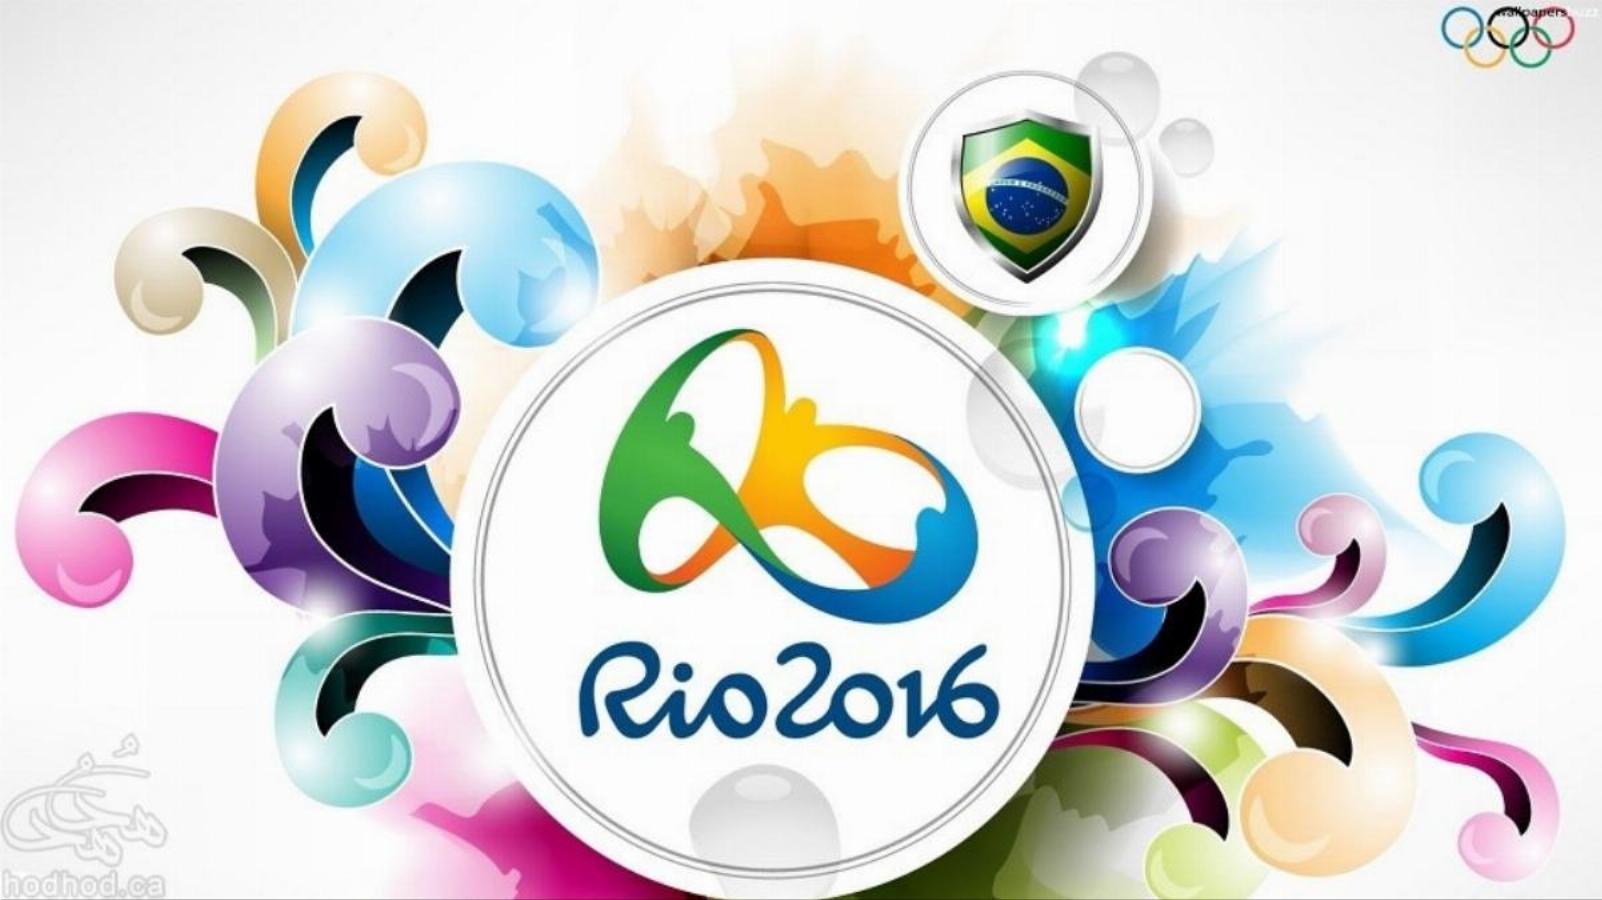 رقابت های المپیک ریو 2016 و حضور کانادا، ایران، افغانستان و تاجیکستان